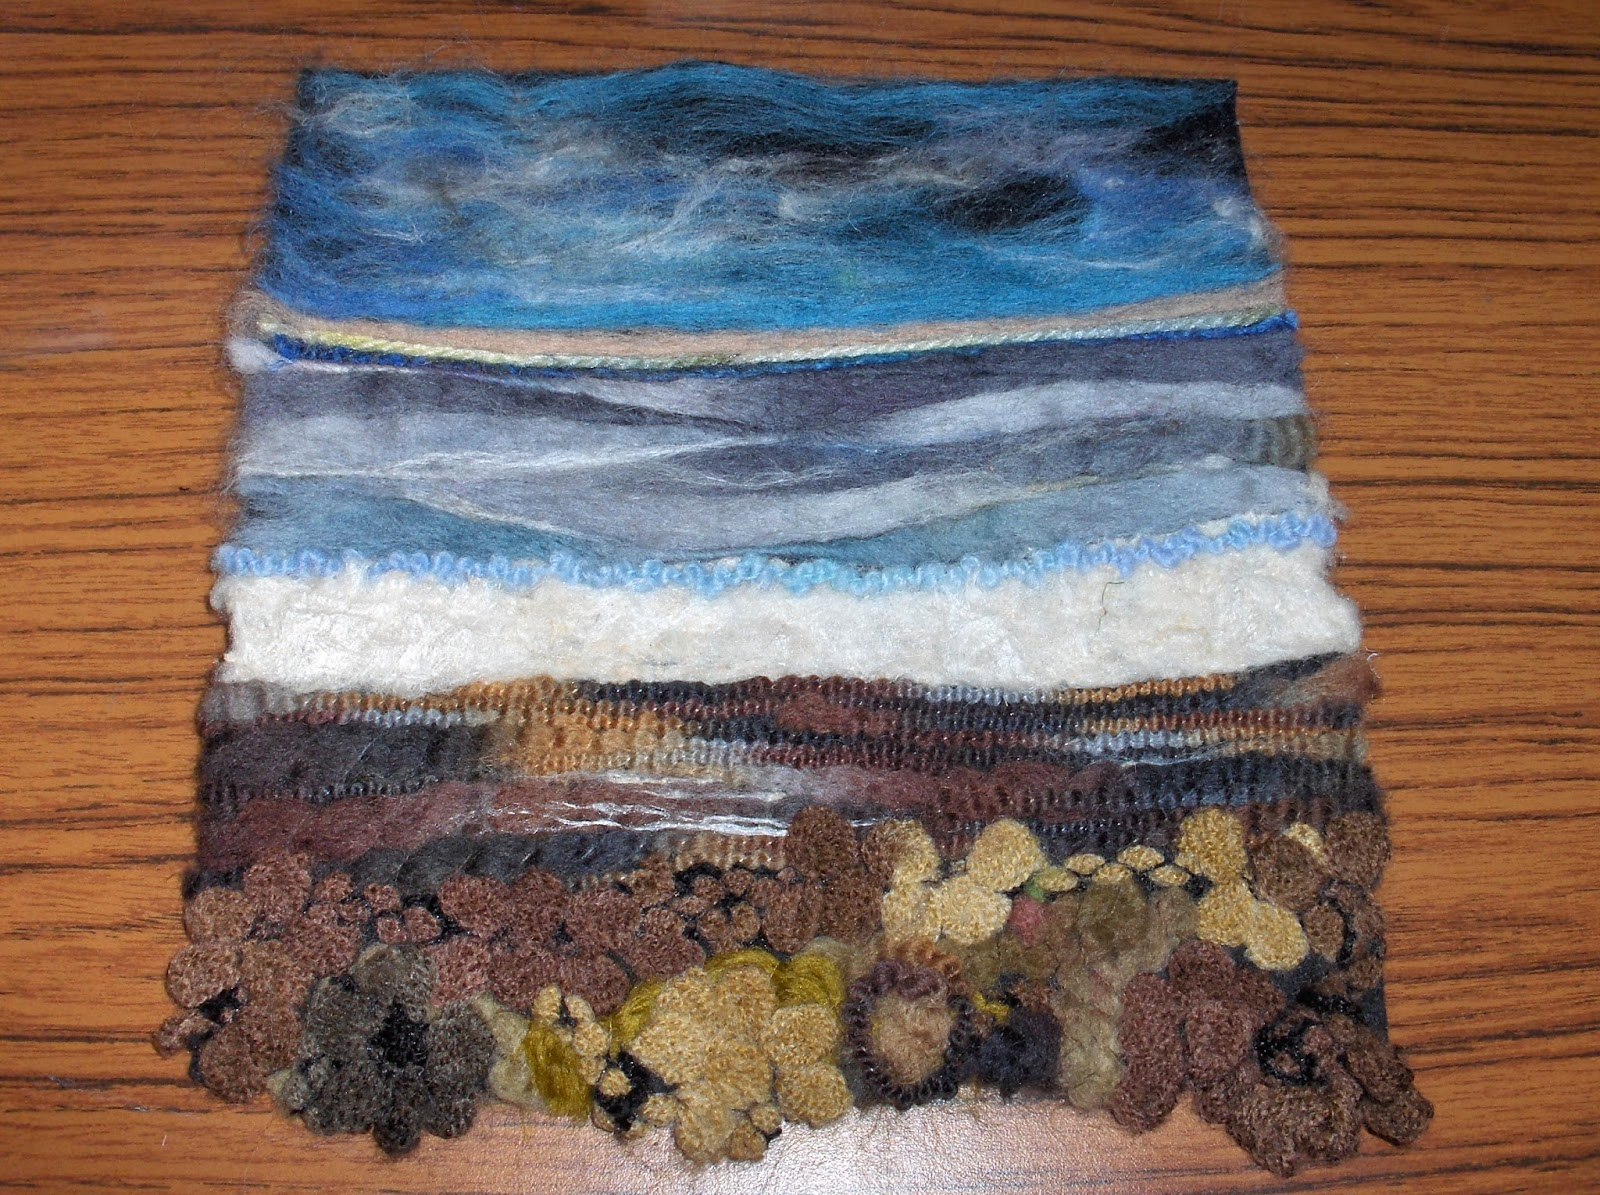 torbay textiles machine knitted felt landscapeseascape